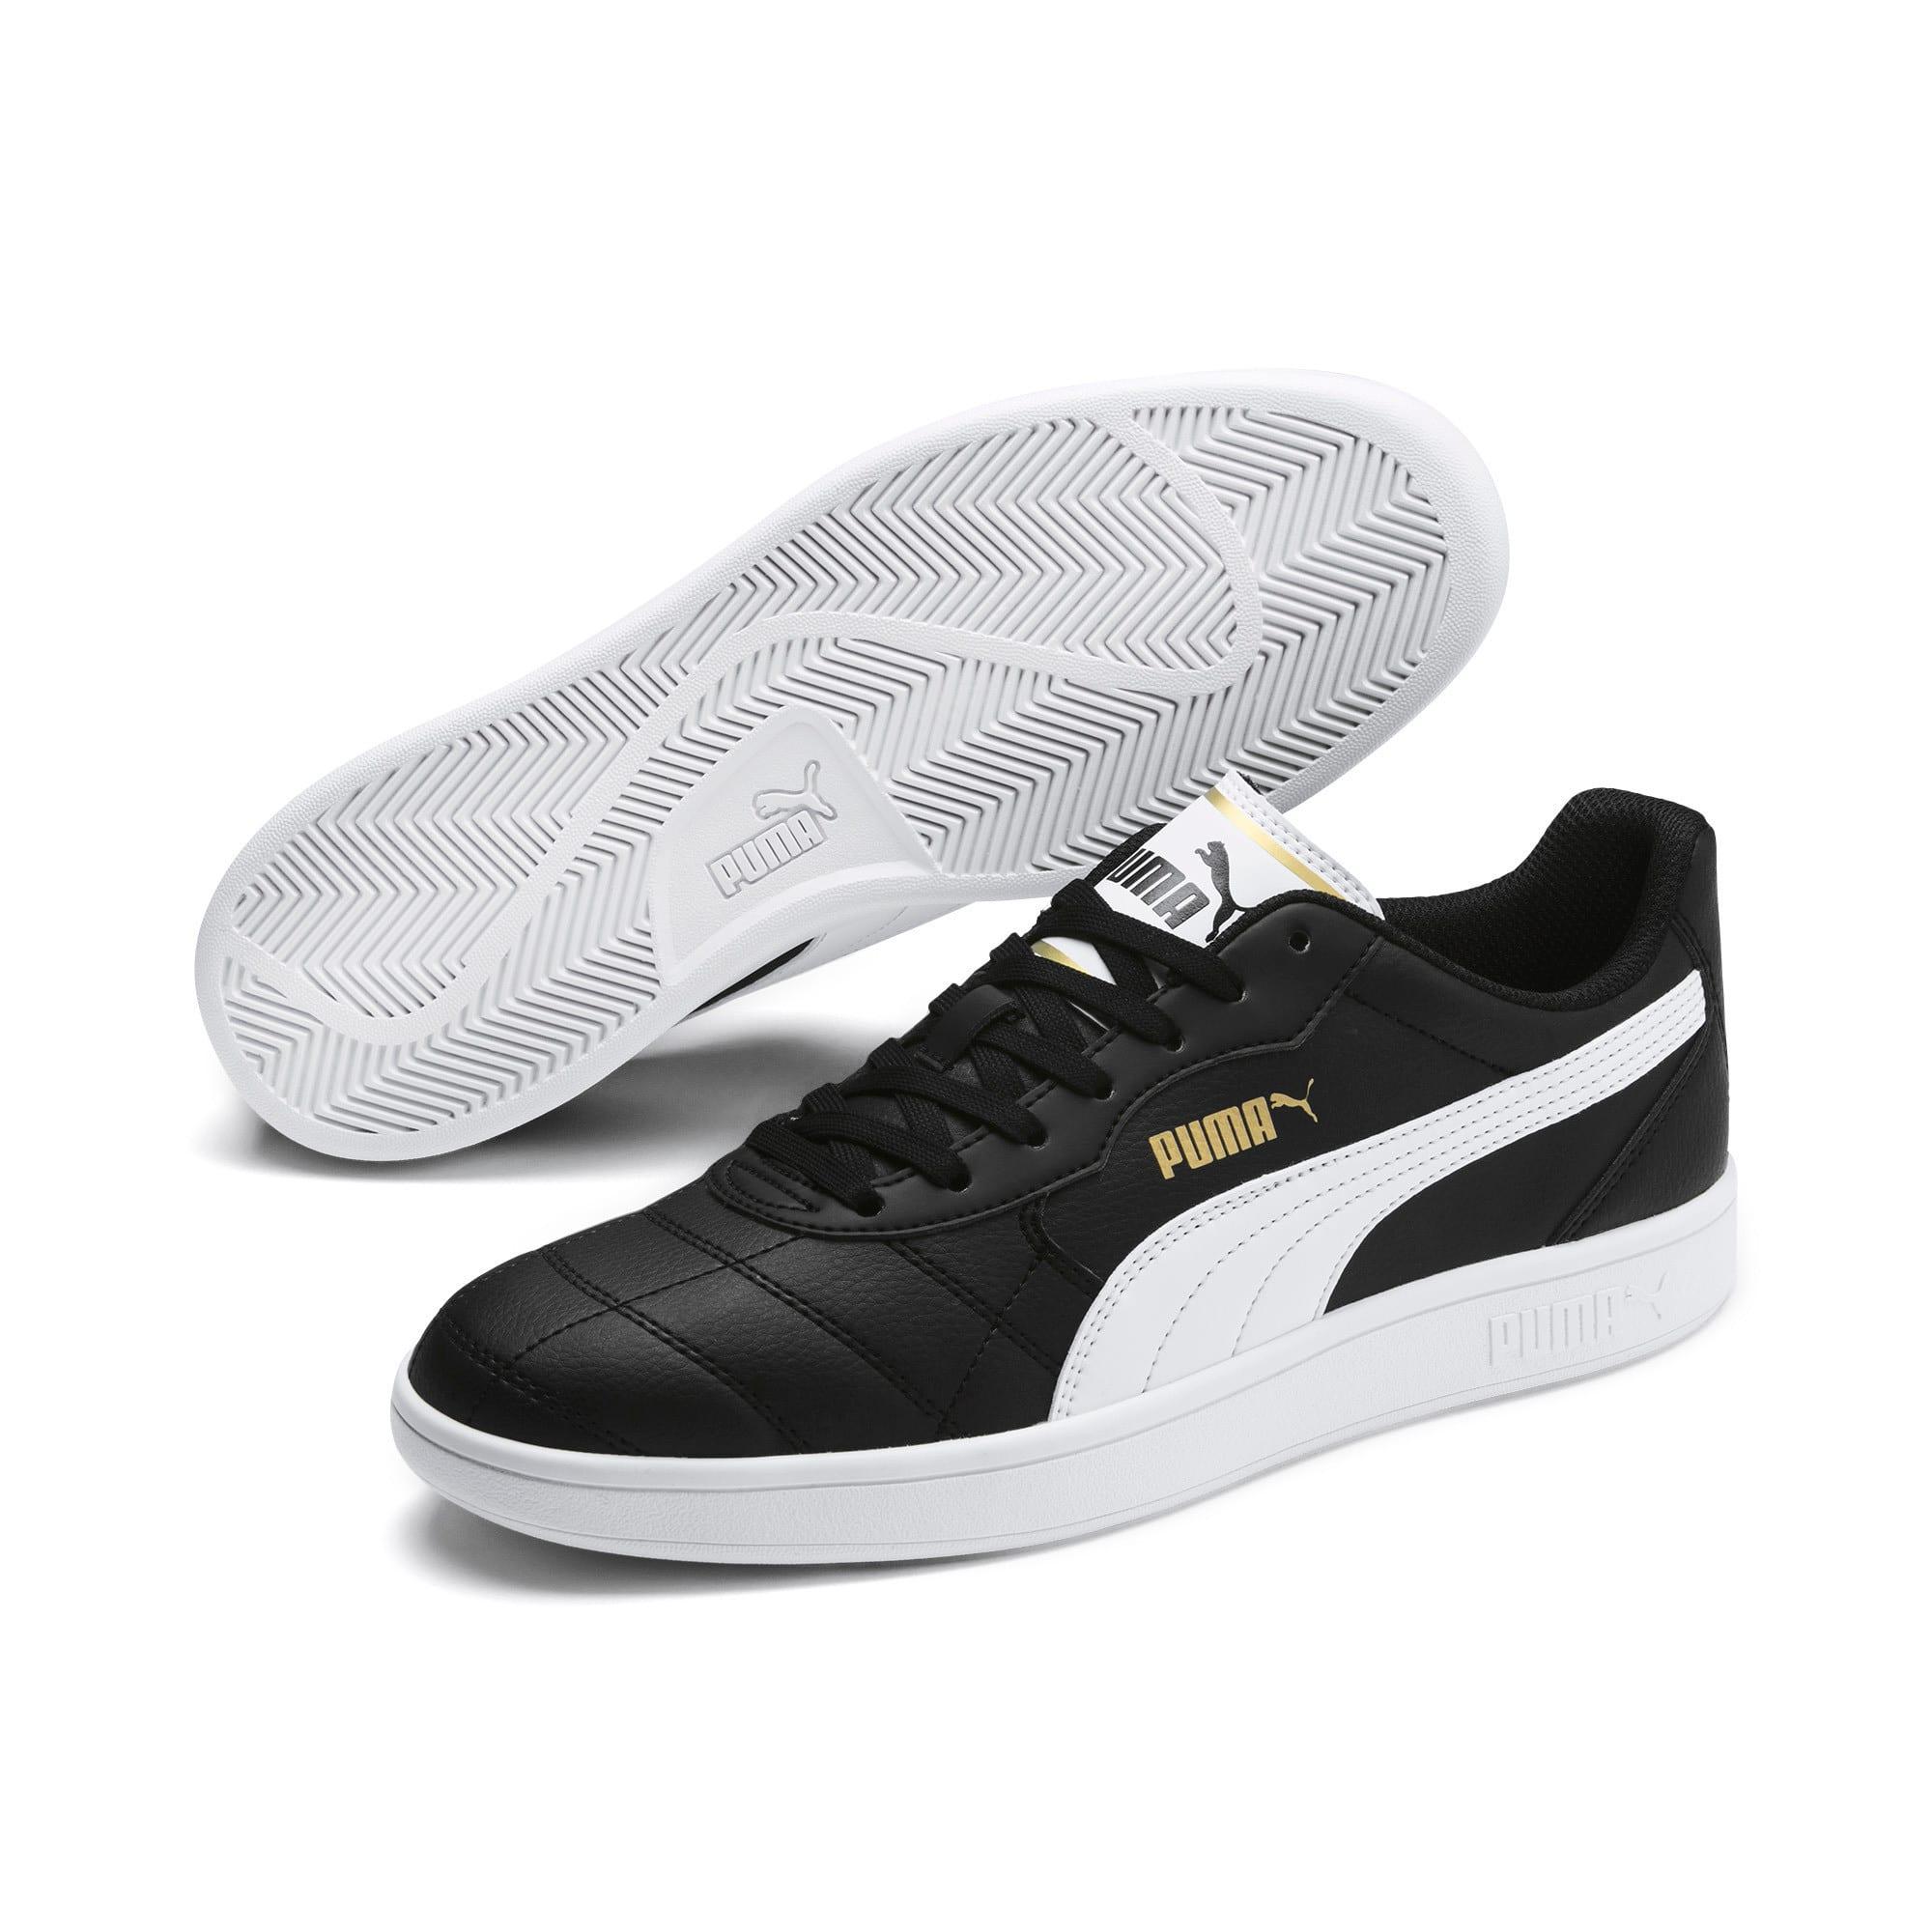 Thumbnail 3 of Astro Kick SL sportschoenen, Puma Black-Gold-Puma White, medium